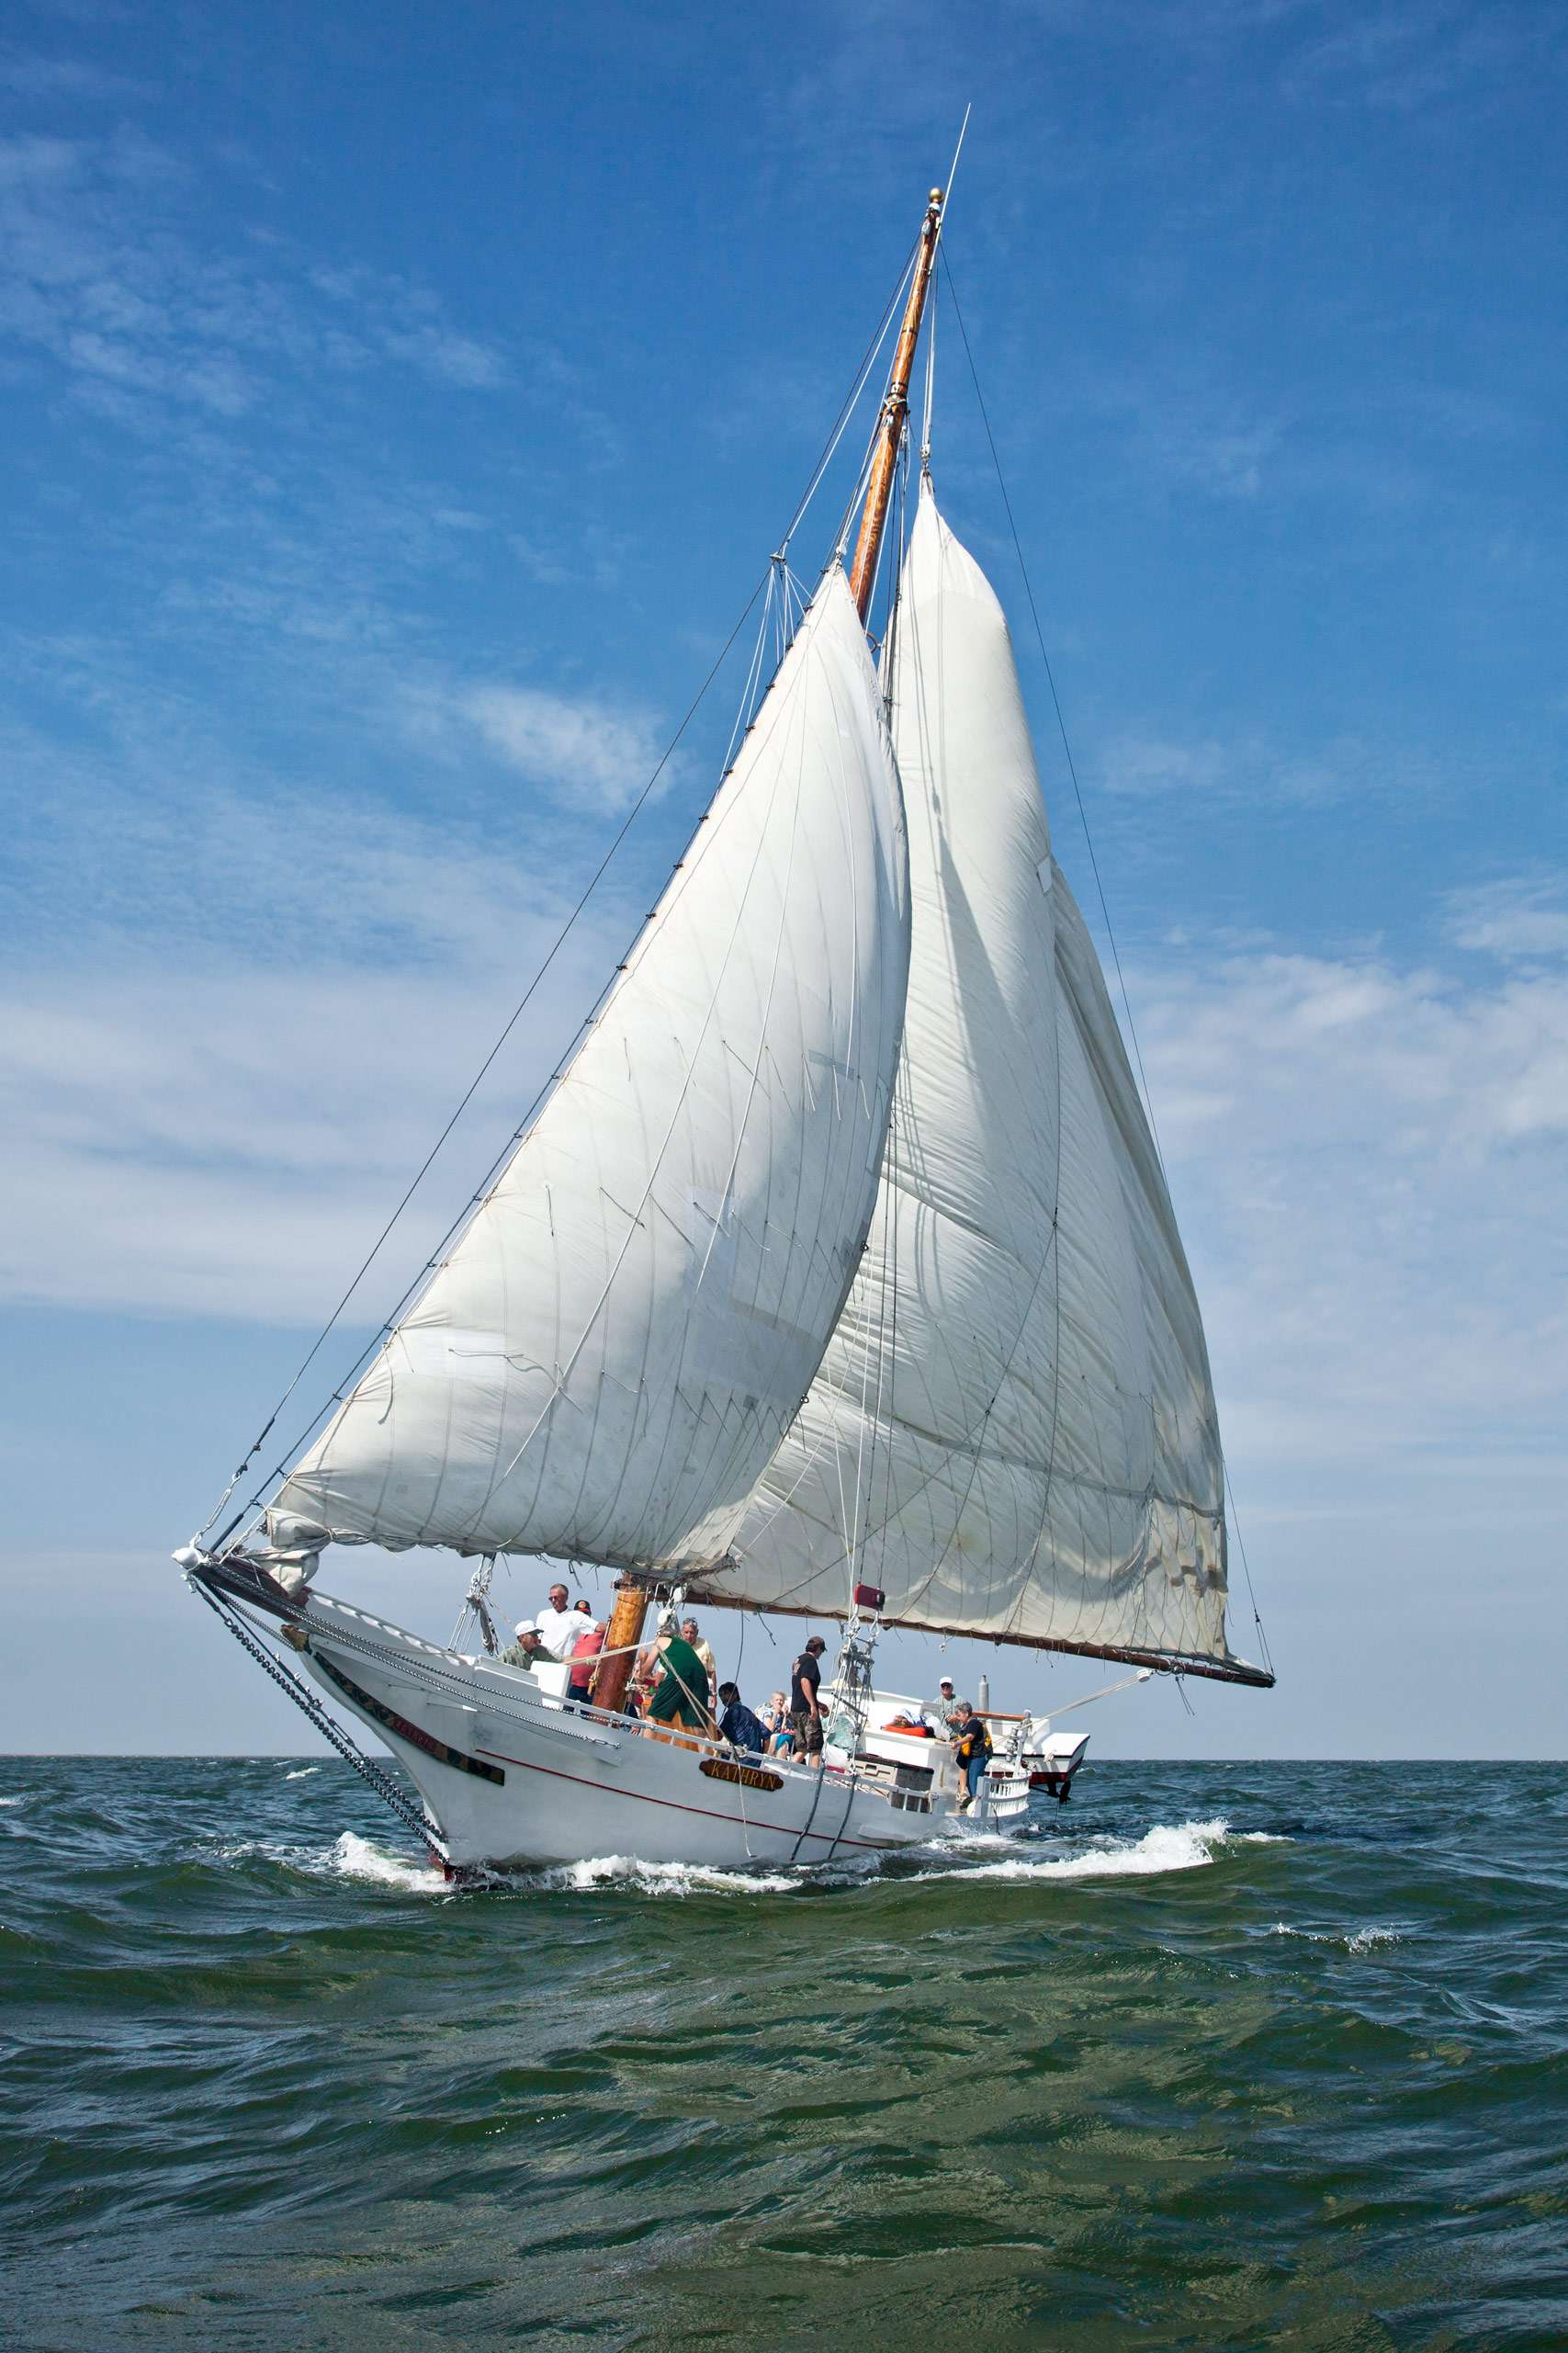 PORTFOLIO - Sailing - Skipjacks #13 PCG763